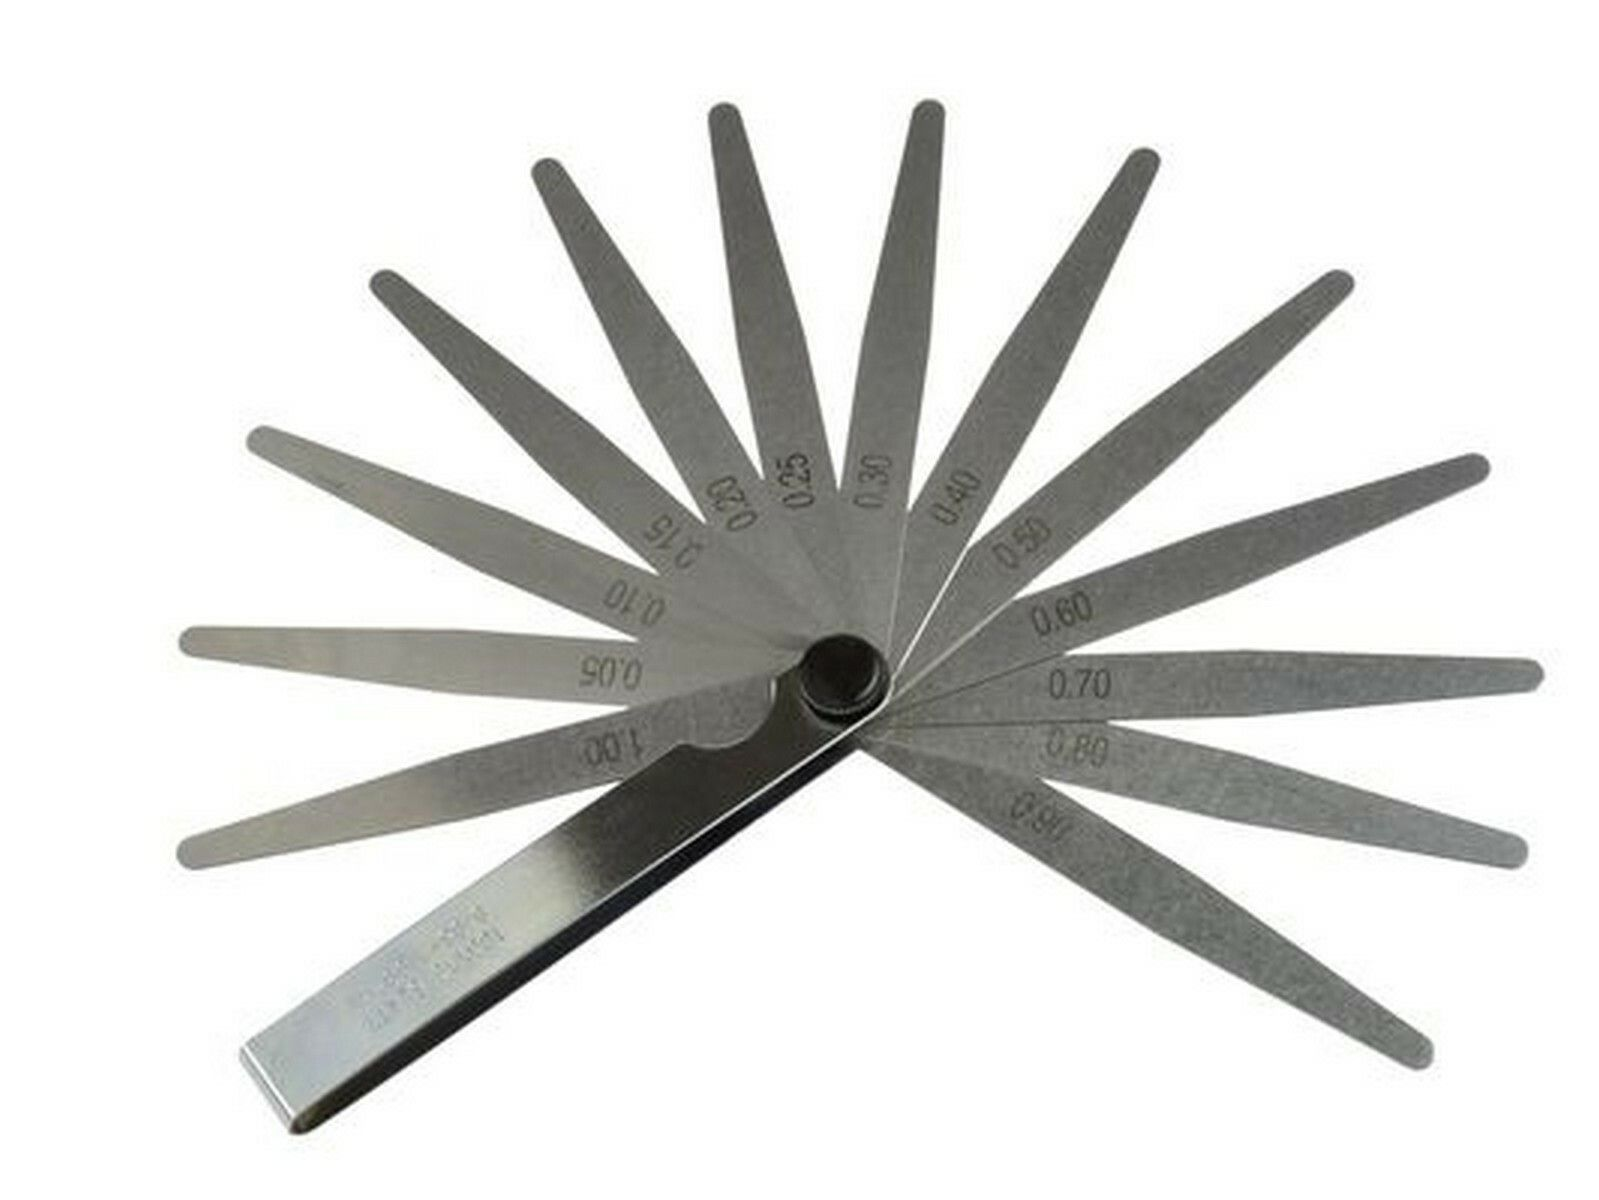 Měrky spárové, 13ks, 0,05-1mm GEKO